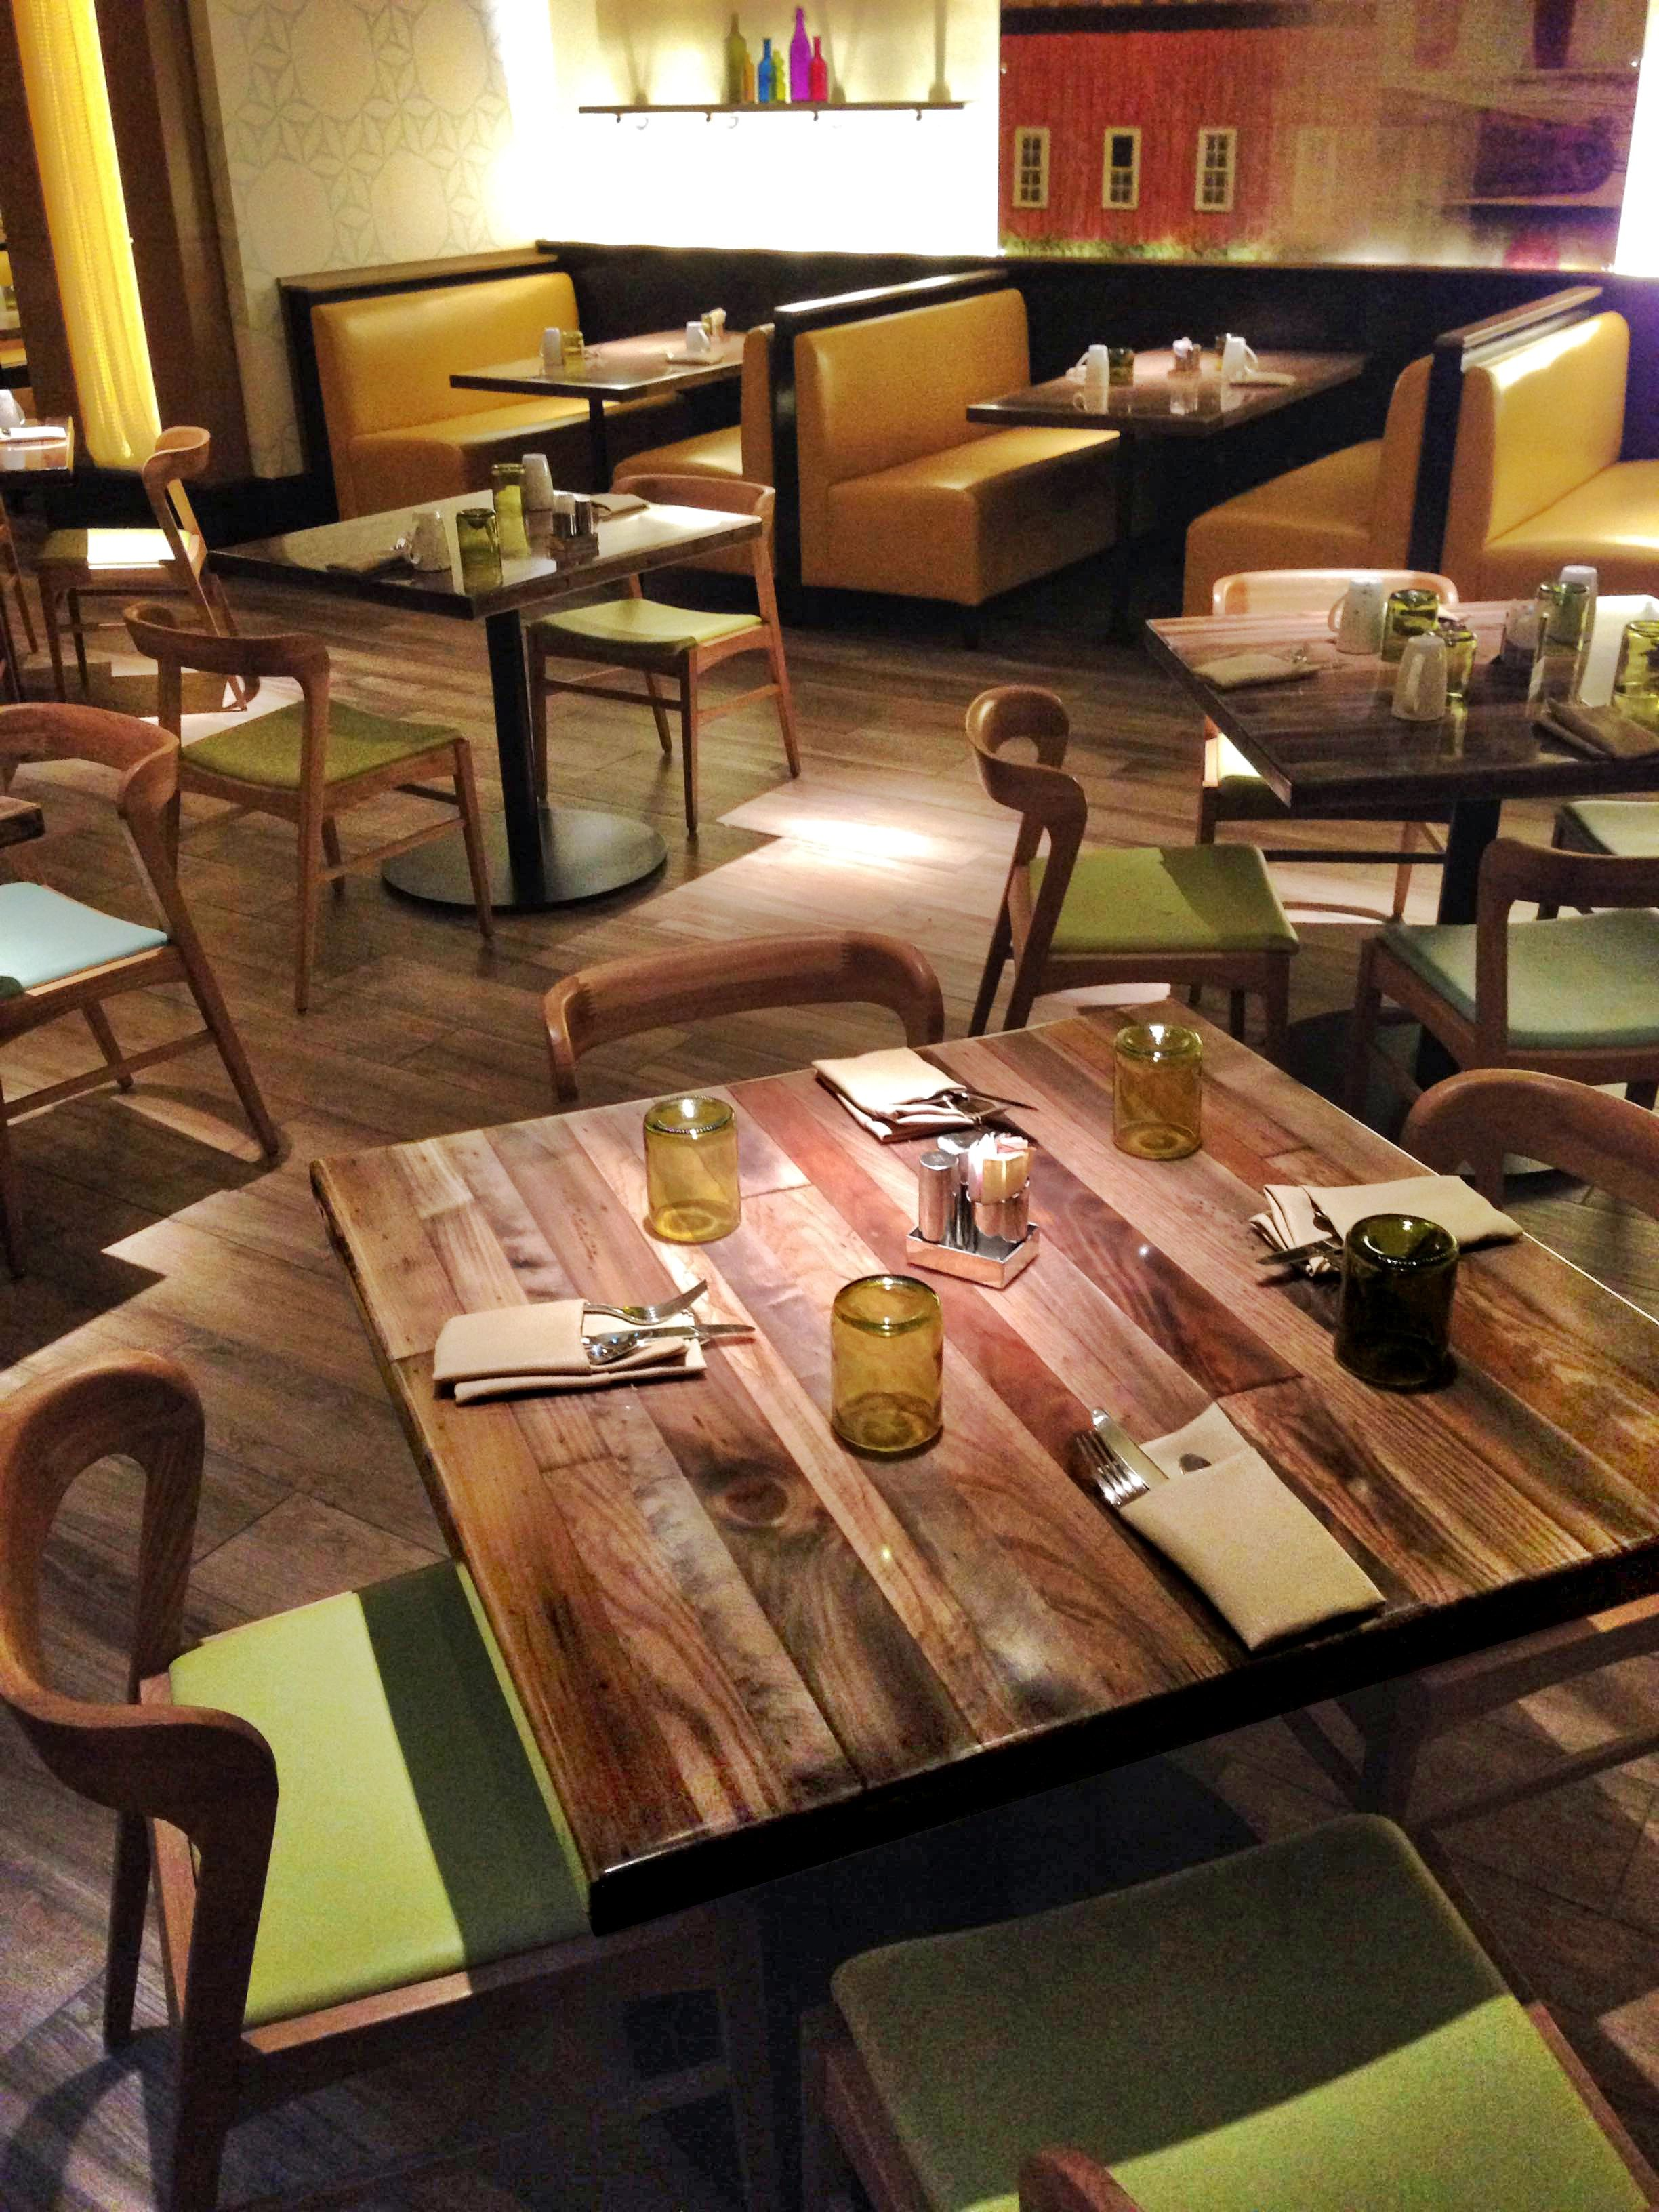 Pinitforlater Tabletopics Restaurant Hospitality Tables Tabletops Marketingstrategy Custom Design Acralytex Resin Letstalktables Table